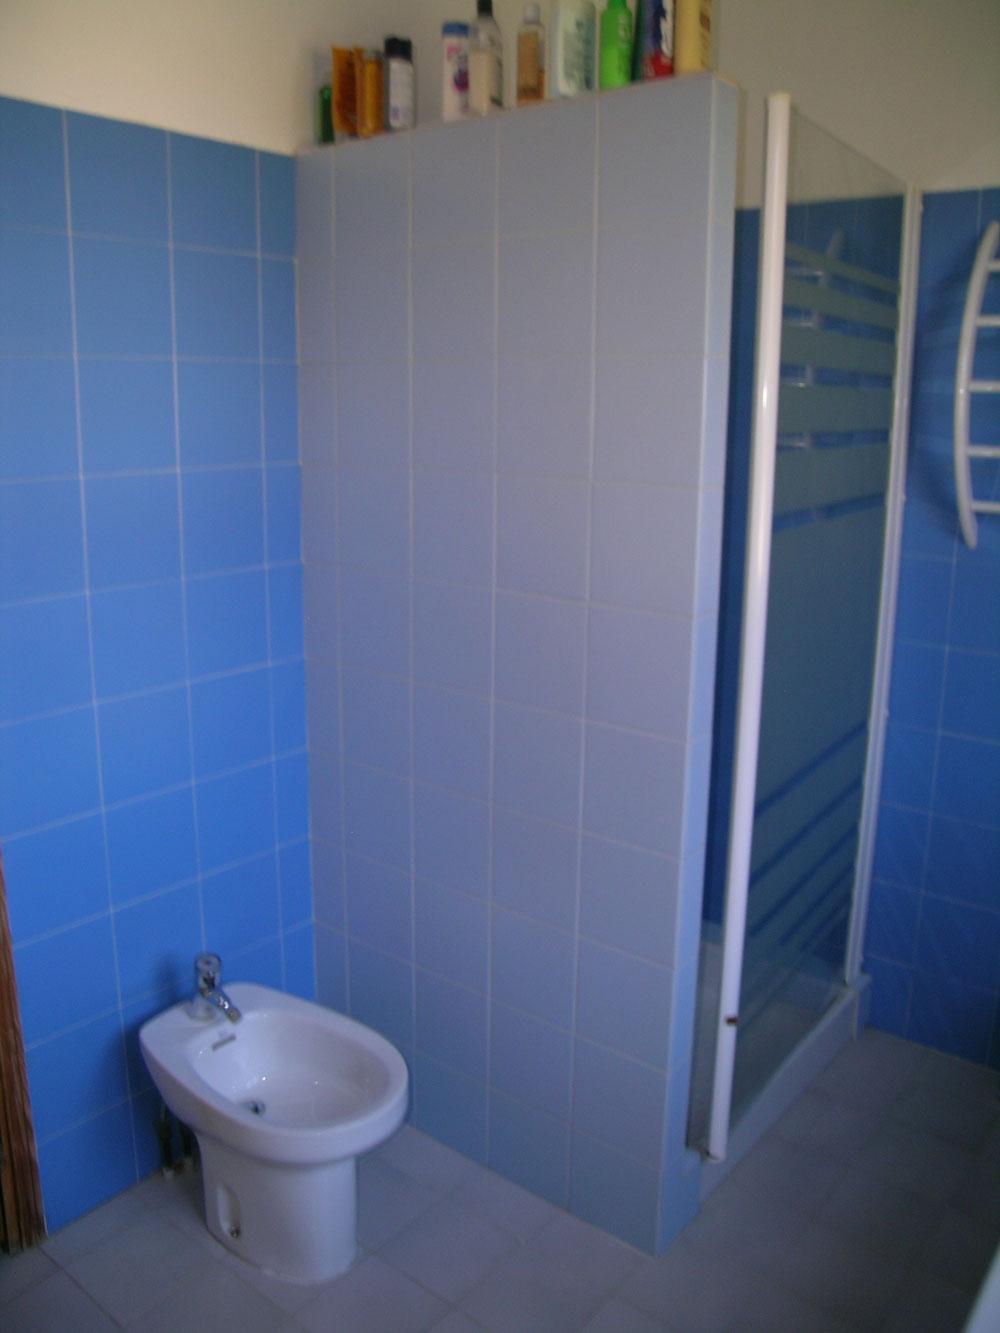 nettoyer carrelage salle de bain encrass carrelage encrass dans la salle de bains utilisez le. Black Bedroom Furniture Sets. Home Design Ideas